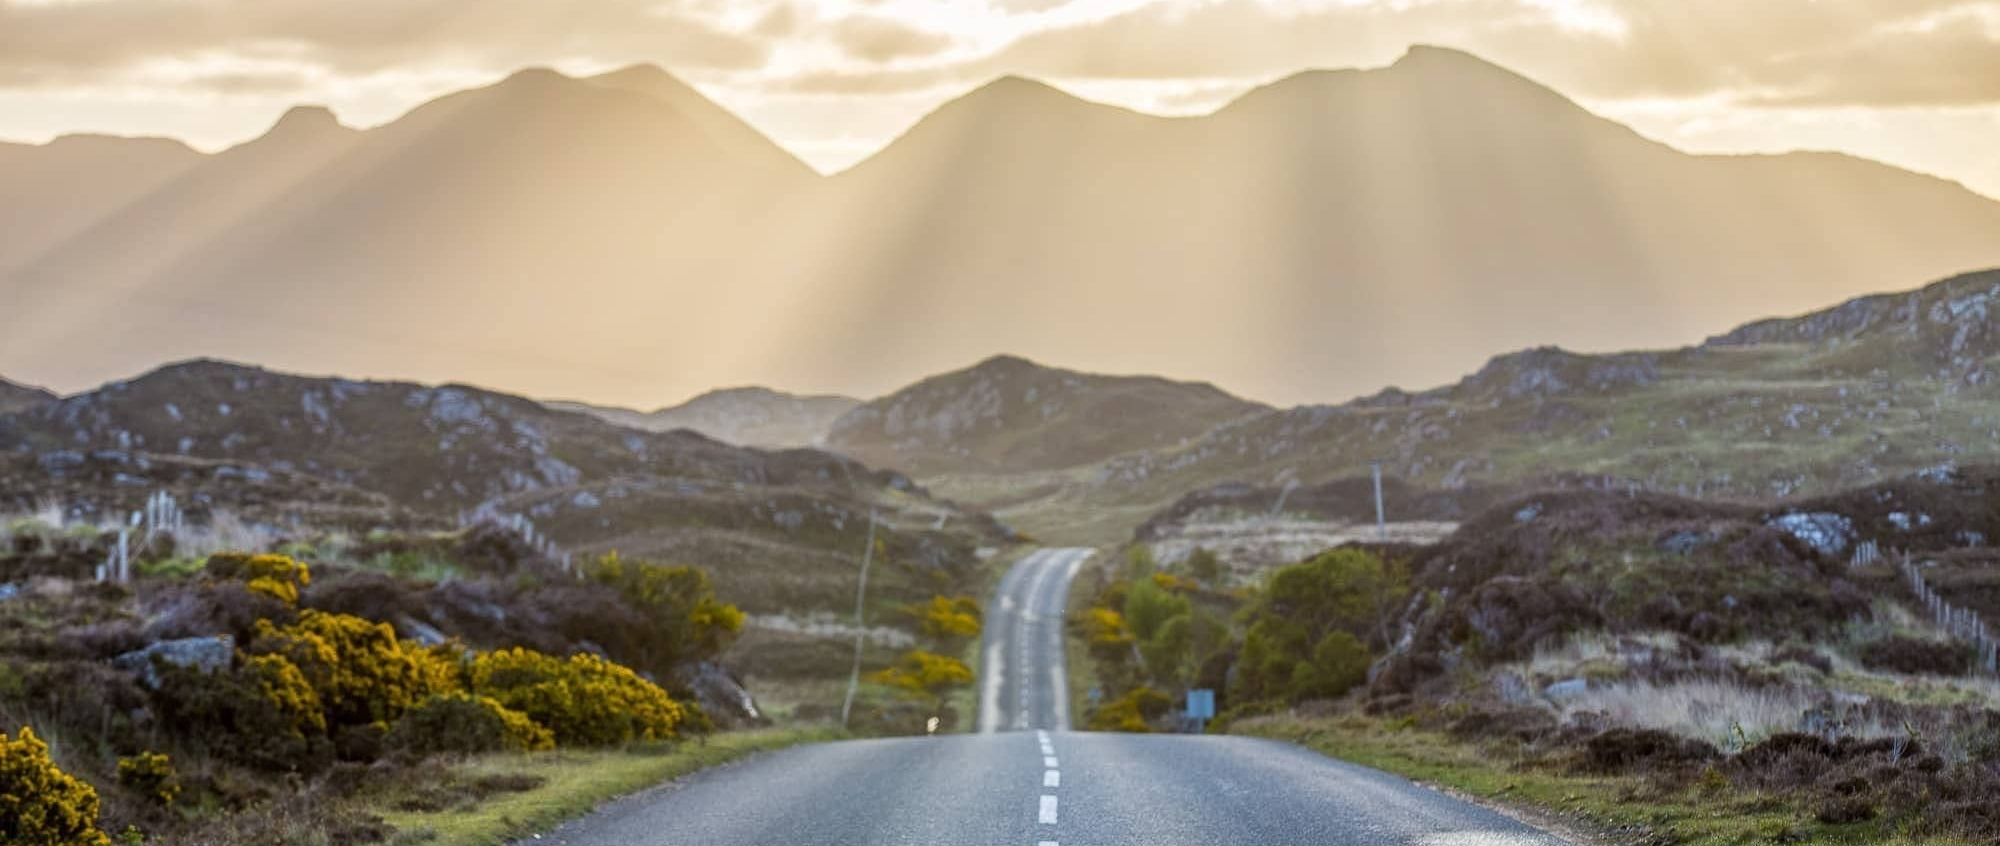 The NC500, a coastal tourist road in Scotland